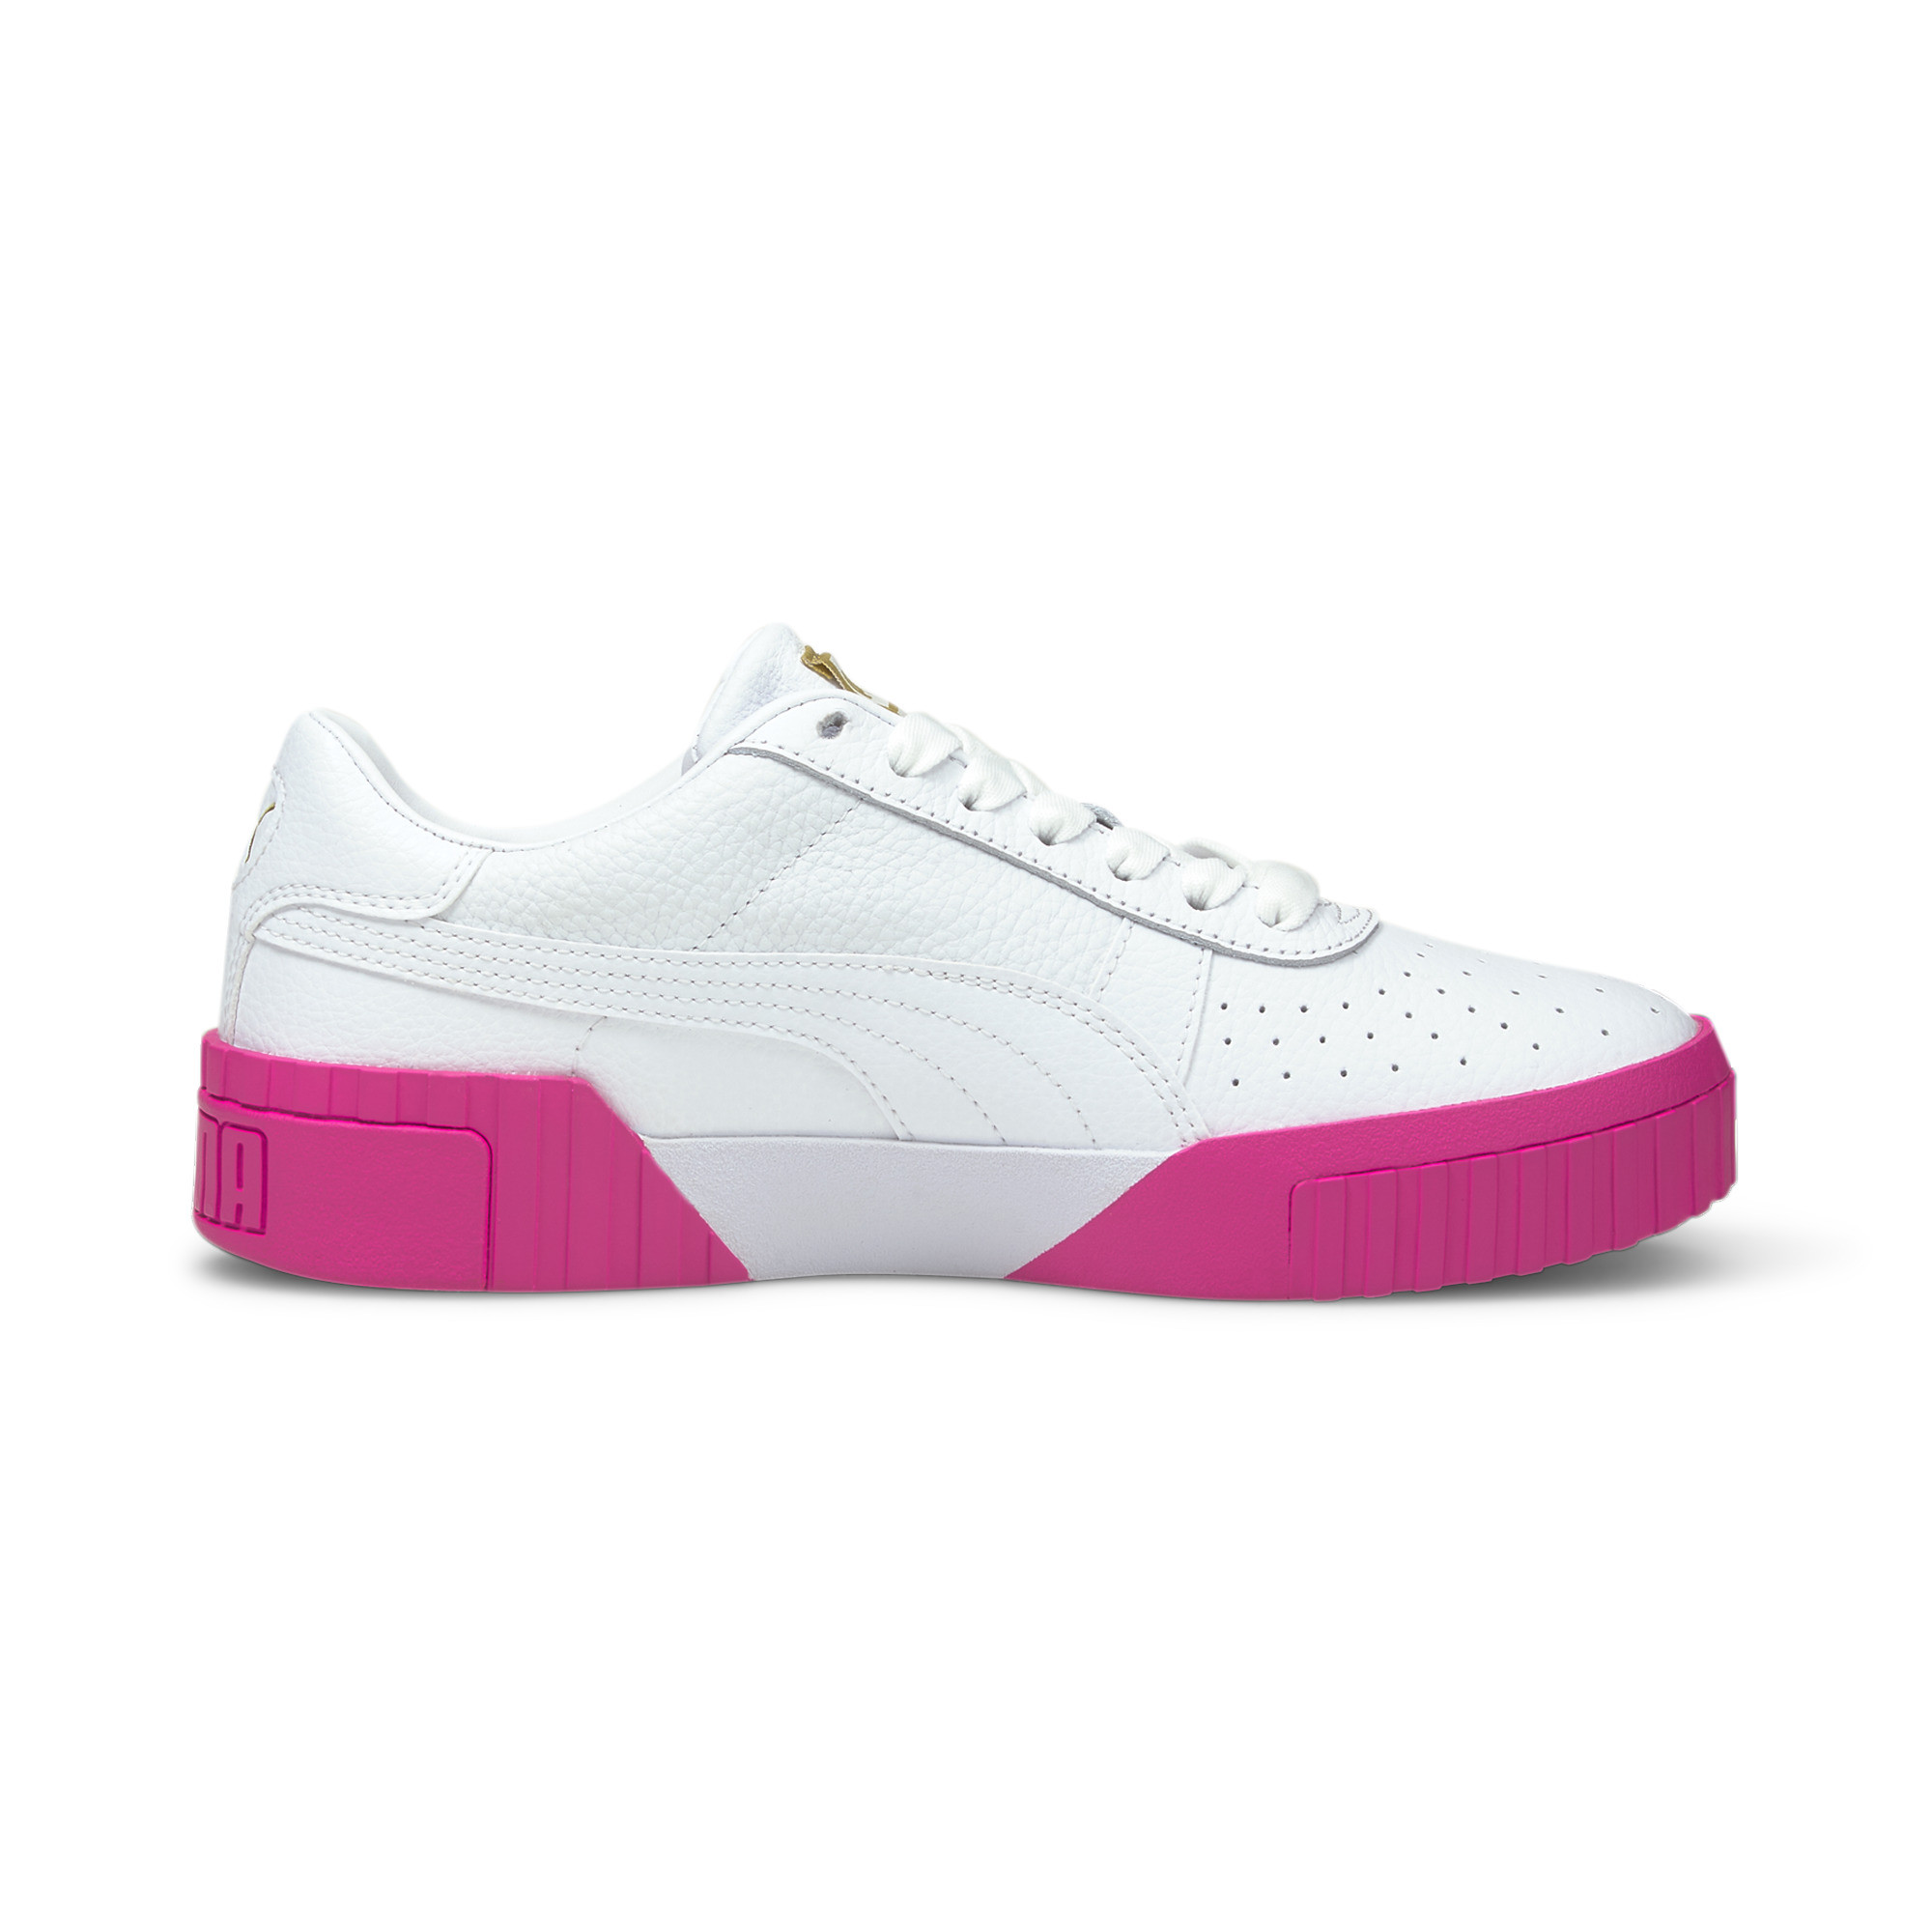 PUMA-Women-039-s-Cali-Sneakers thumbnail 6